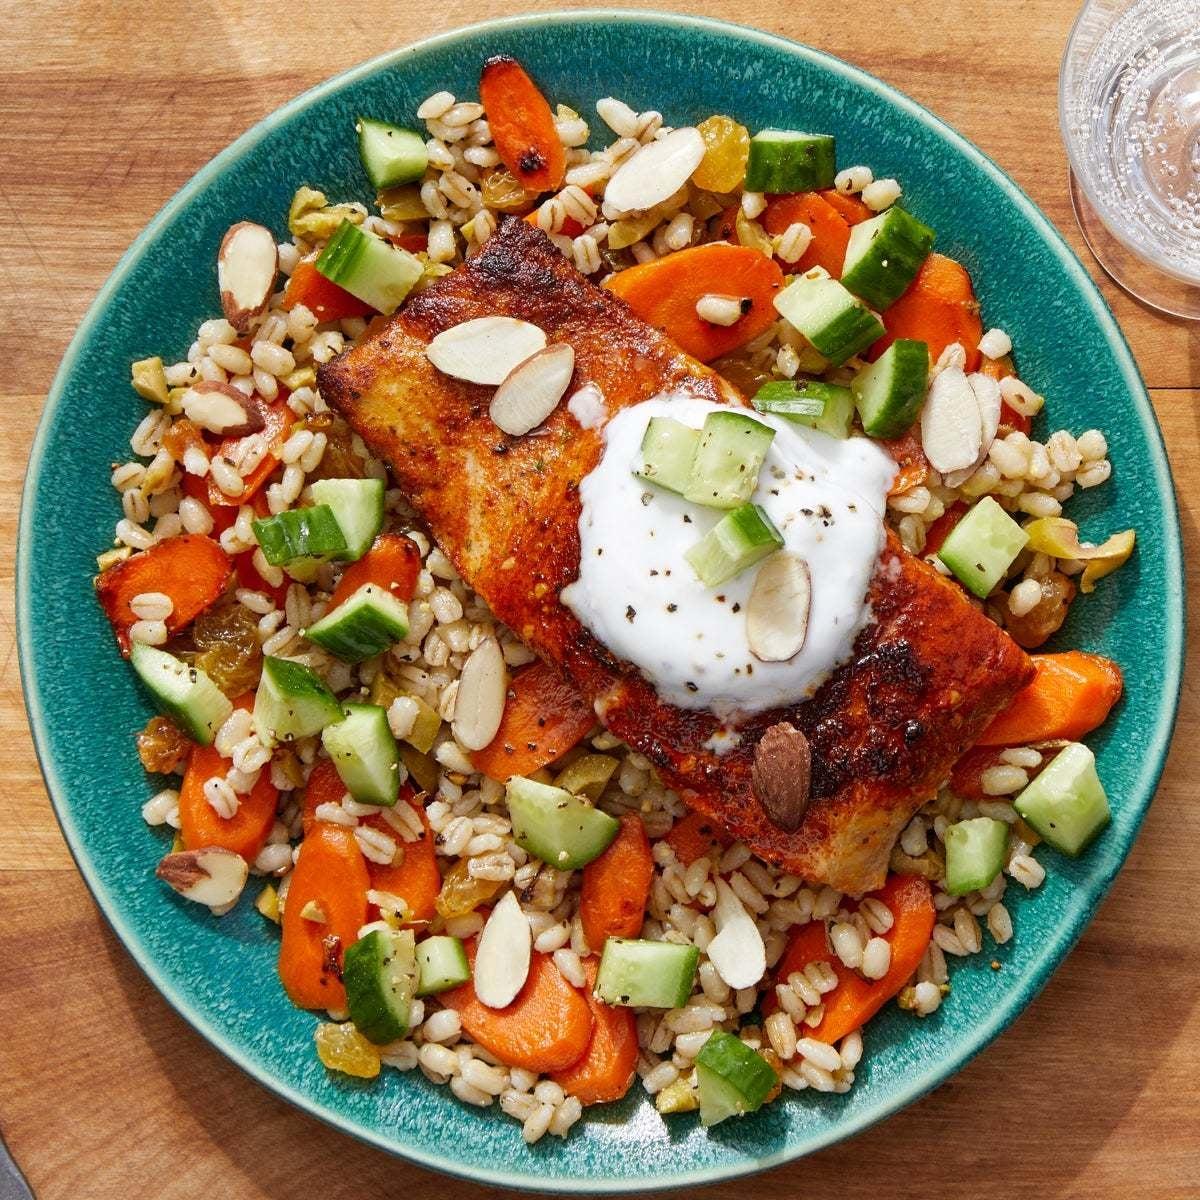 Spiced Salmon & Garlic Yogurt over Barley, Carrots & Olives